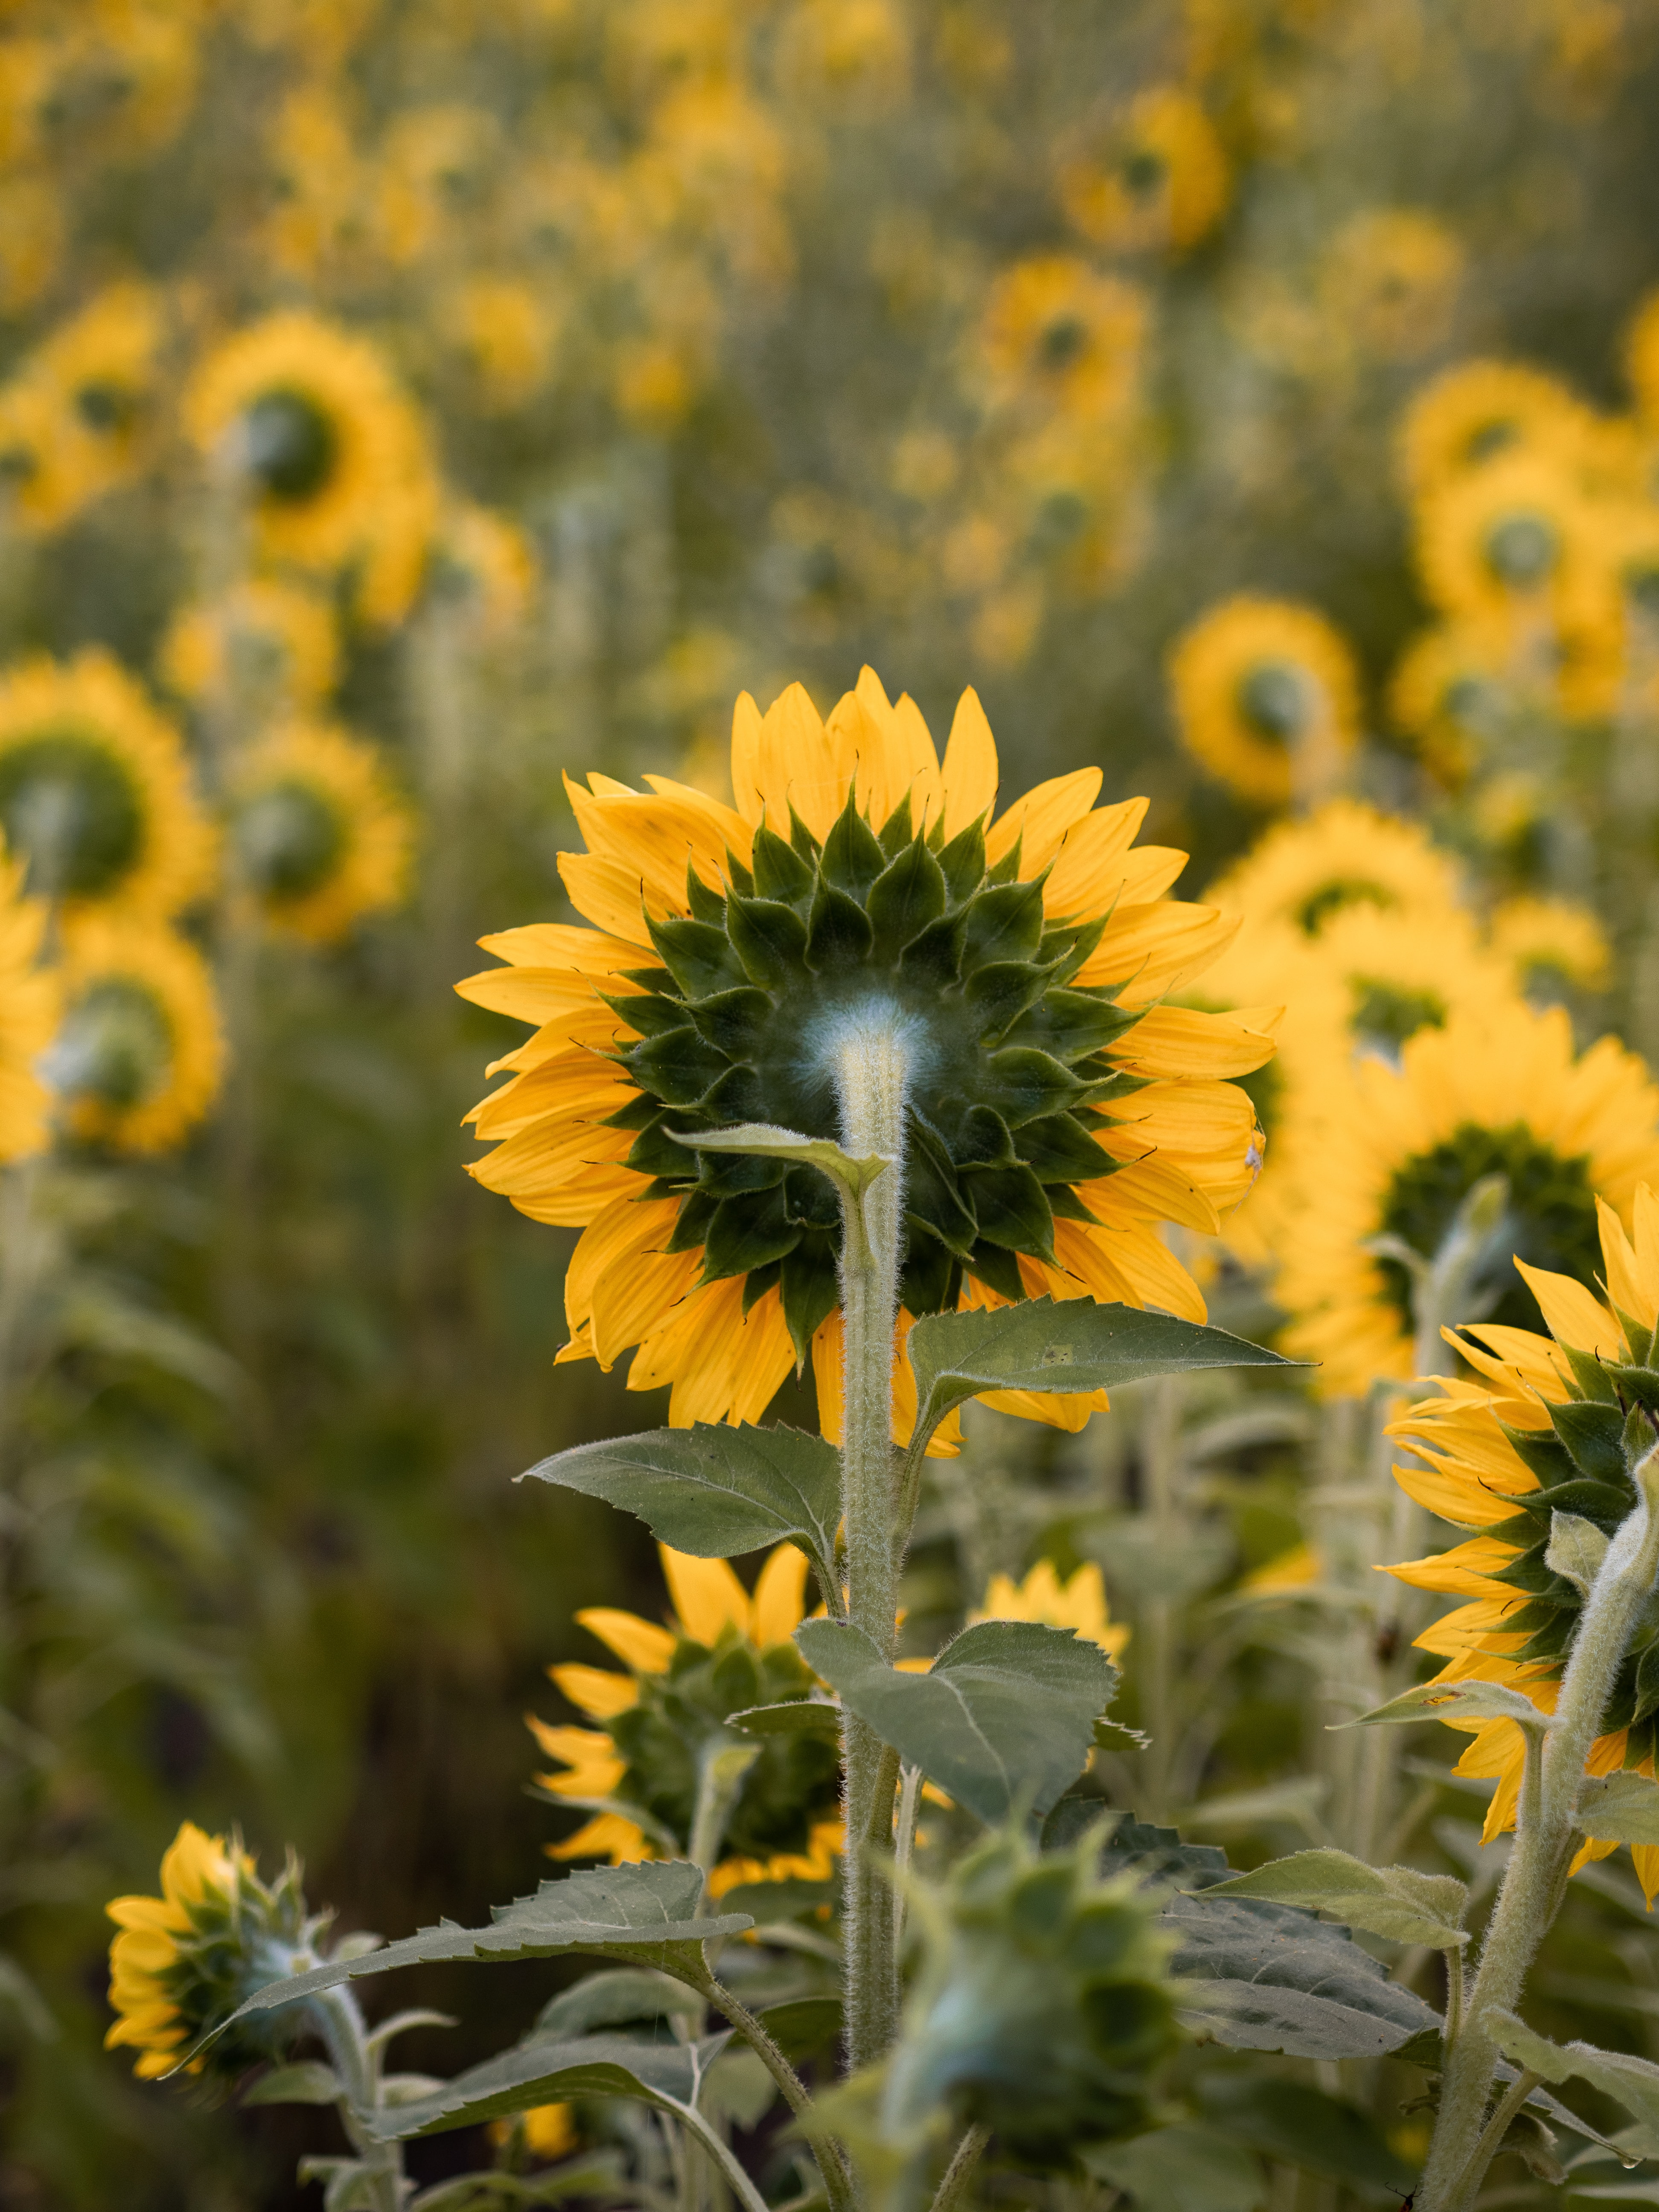 depth photography of yellow sunflower field